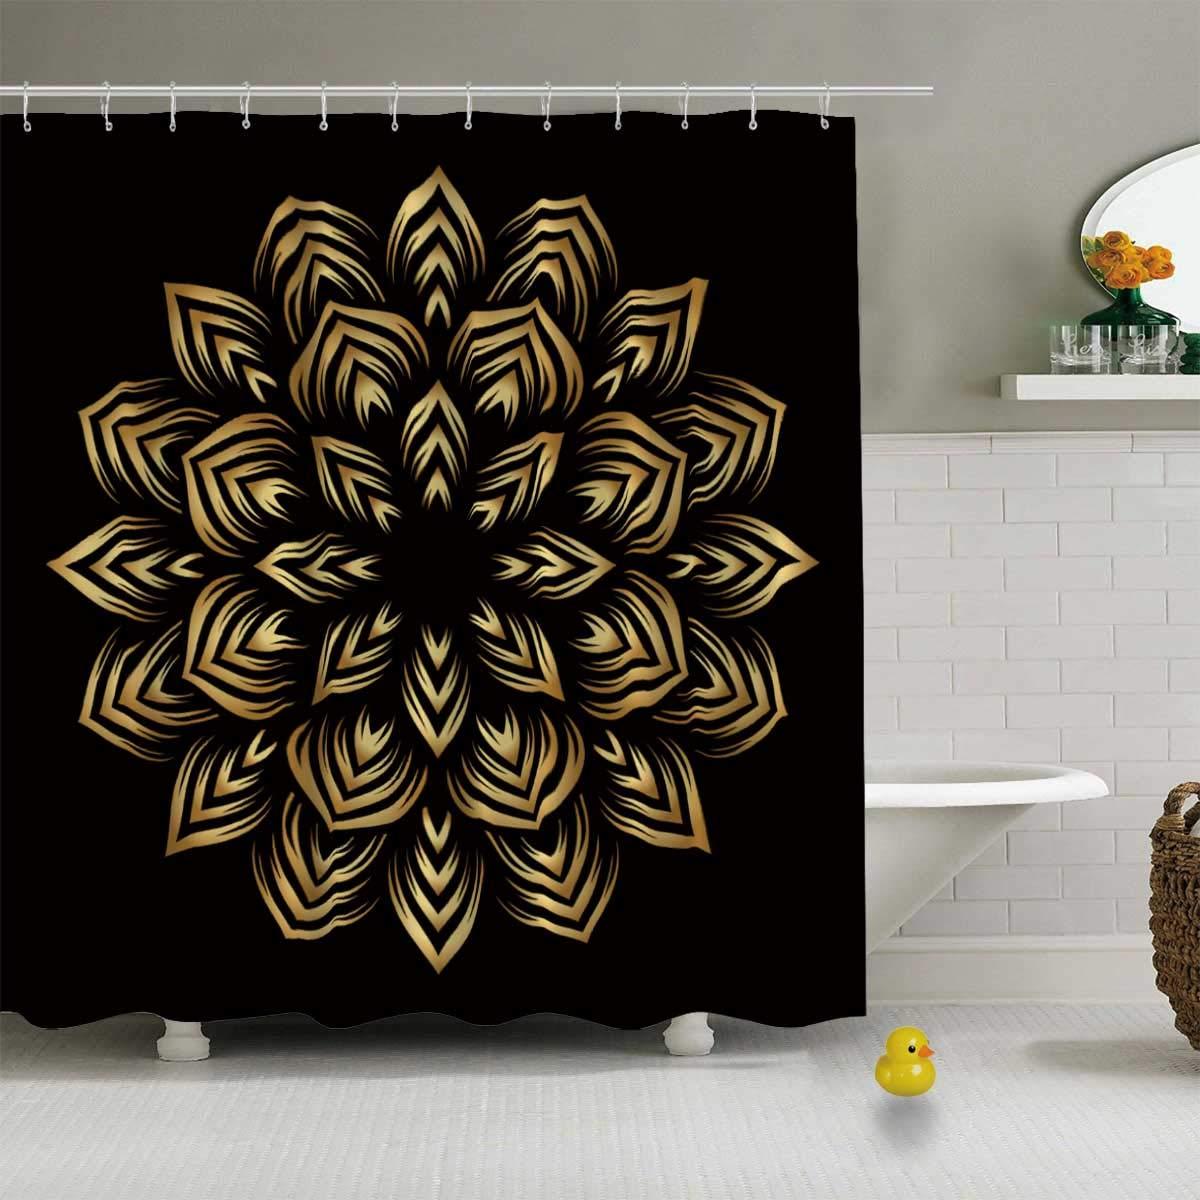 Cortina de ducha duradera para baño, 79L x 72W, diseño redondo dorado Mandala